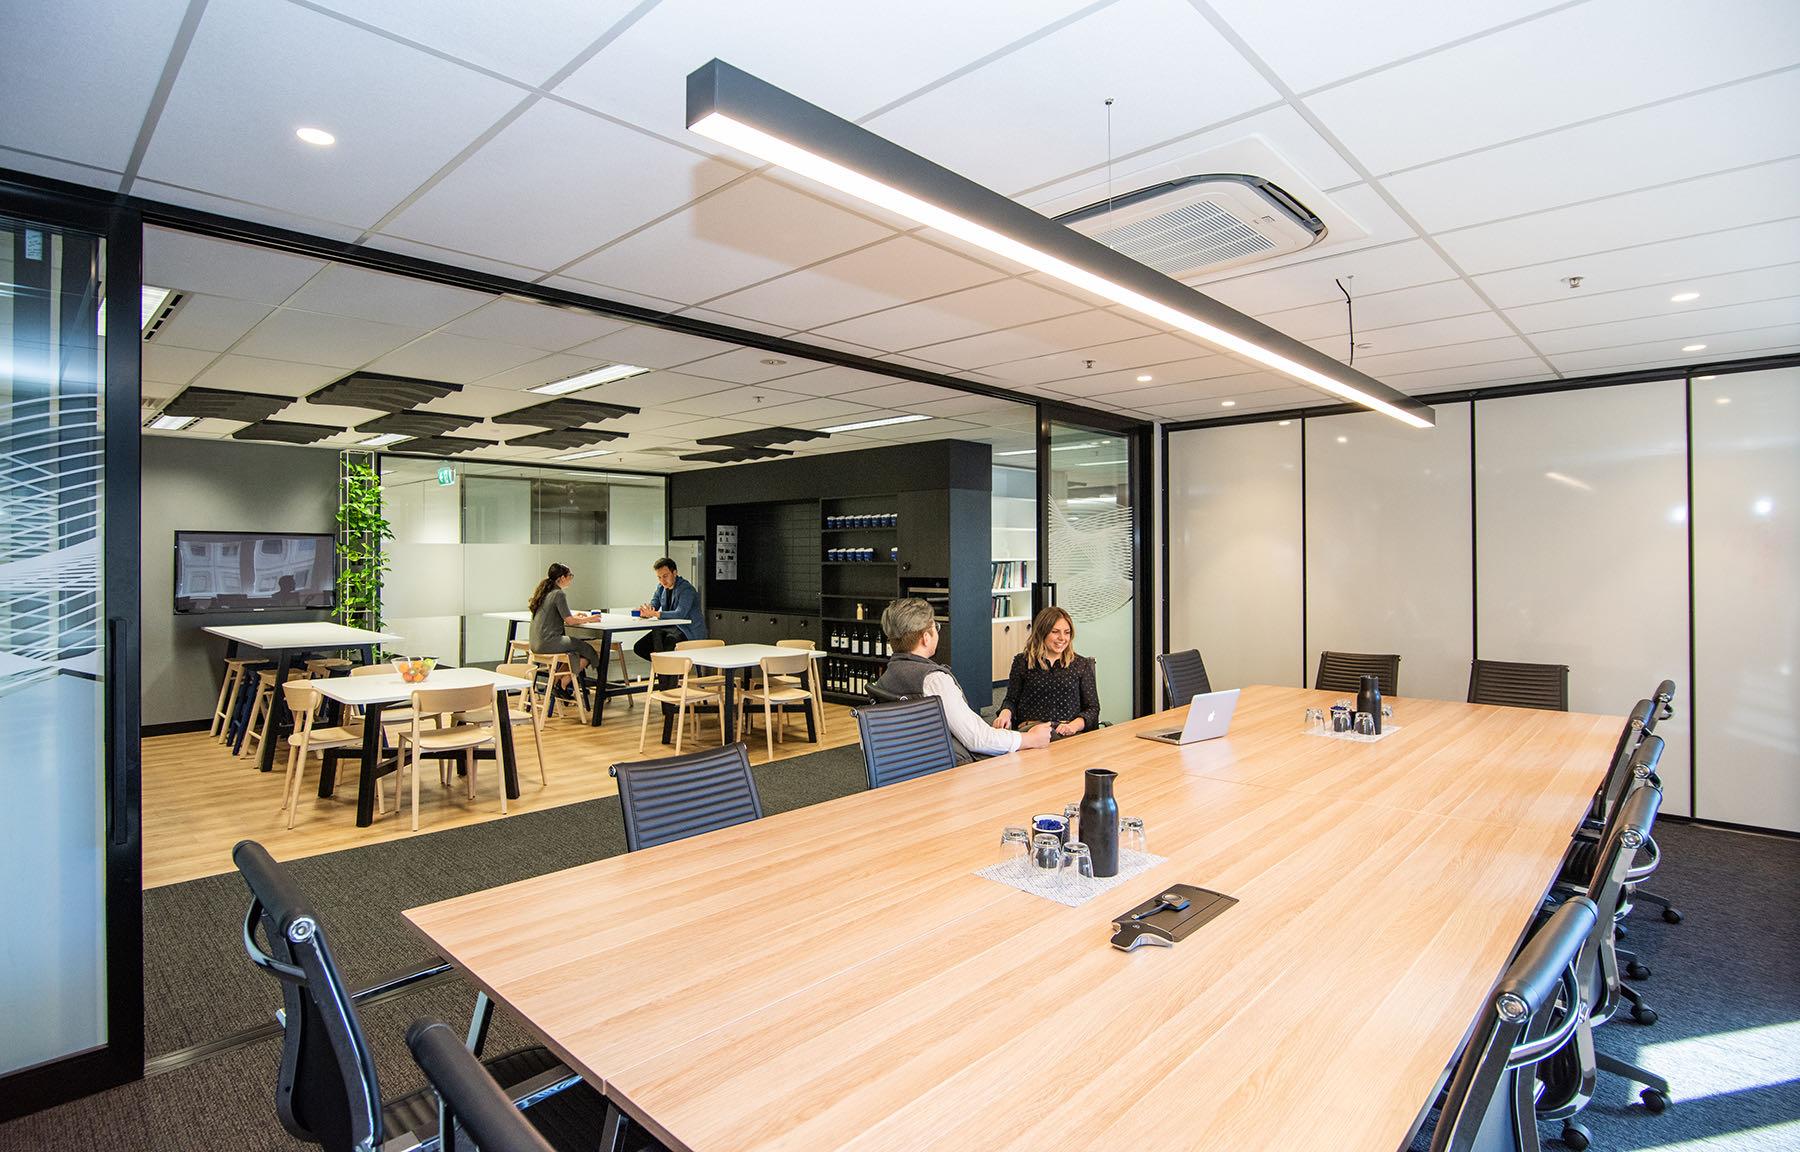 A Look Inside Robert Bird Group's New Adelaide Office